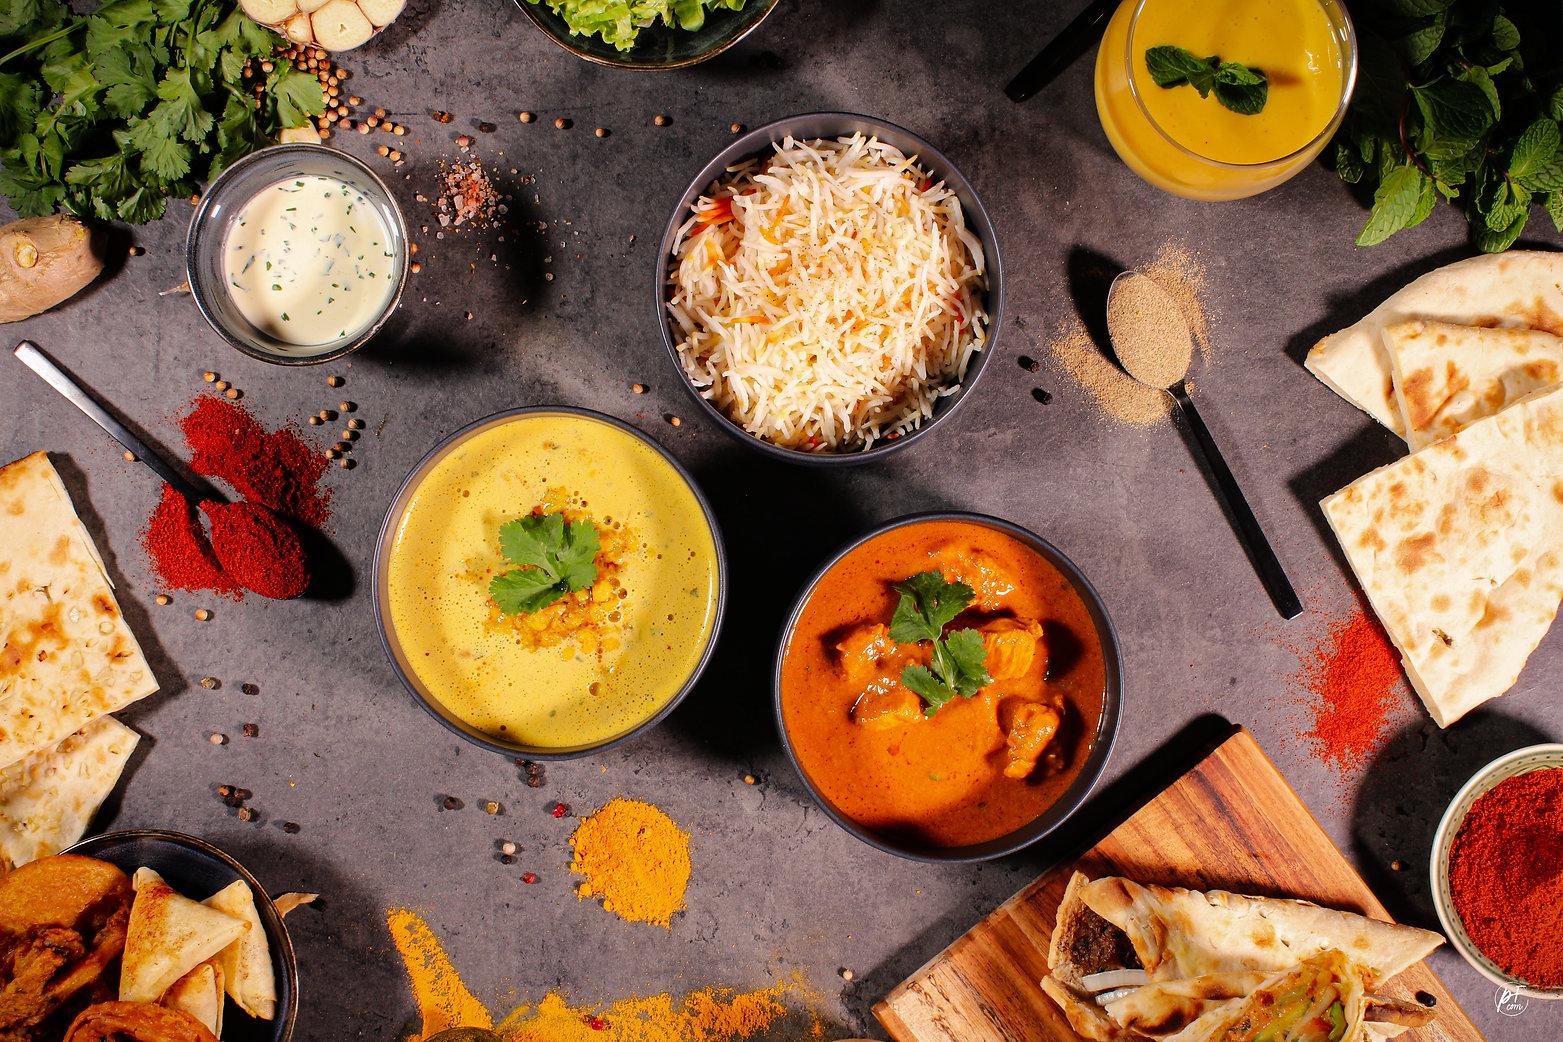 Plats indiens restauration traditionnelle Tandoori Masala Food Truck